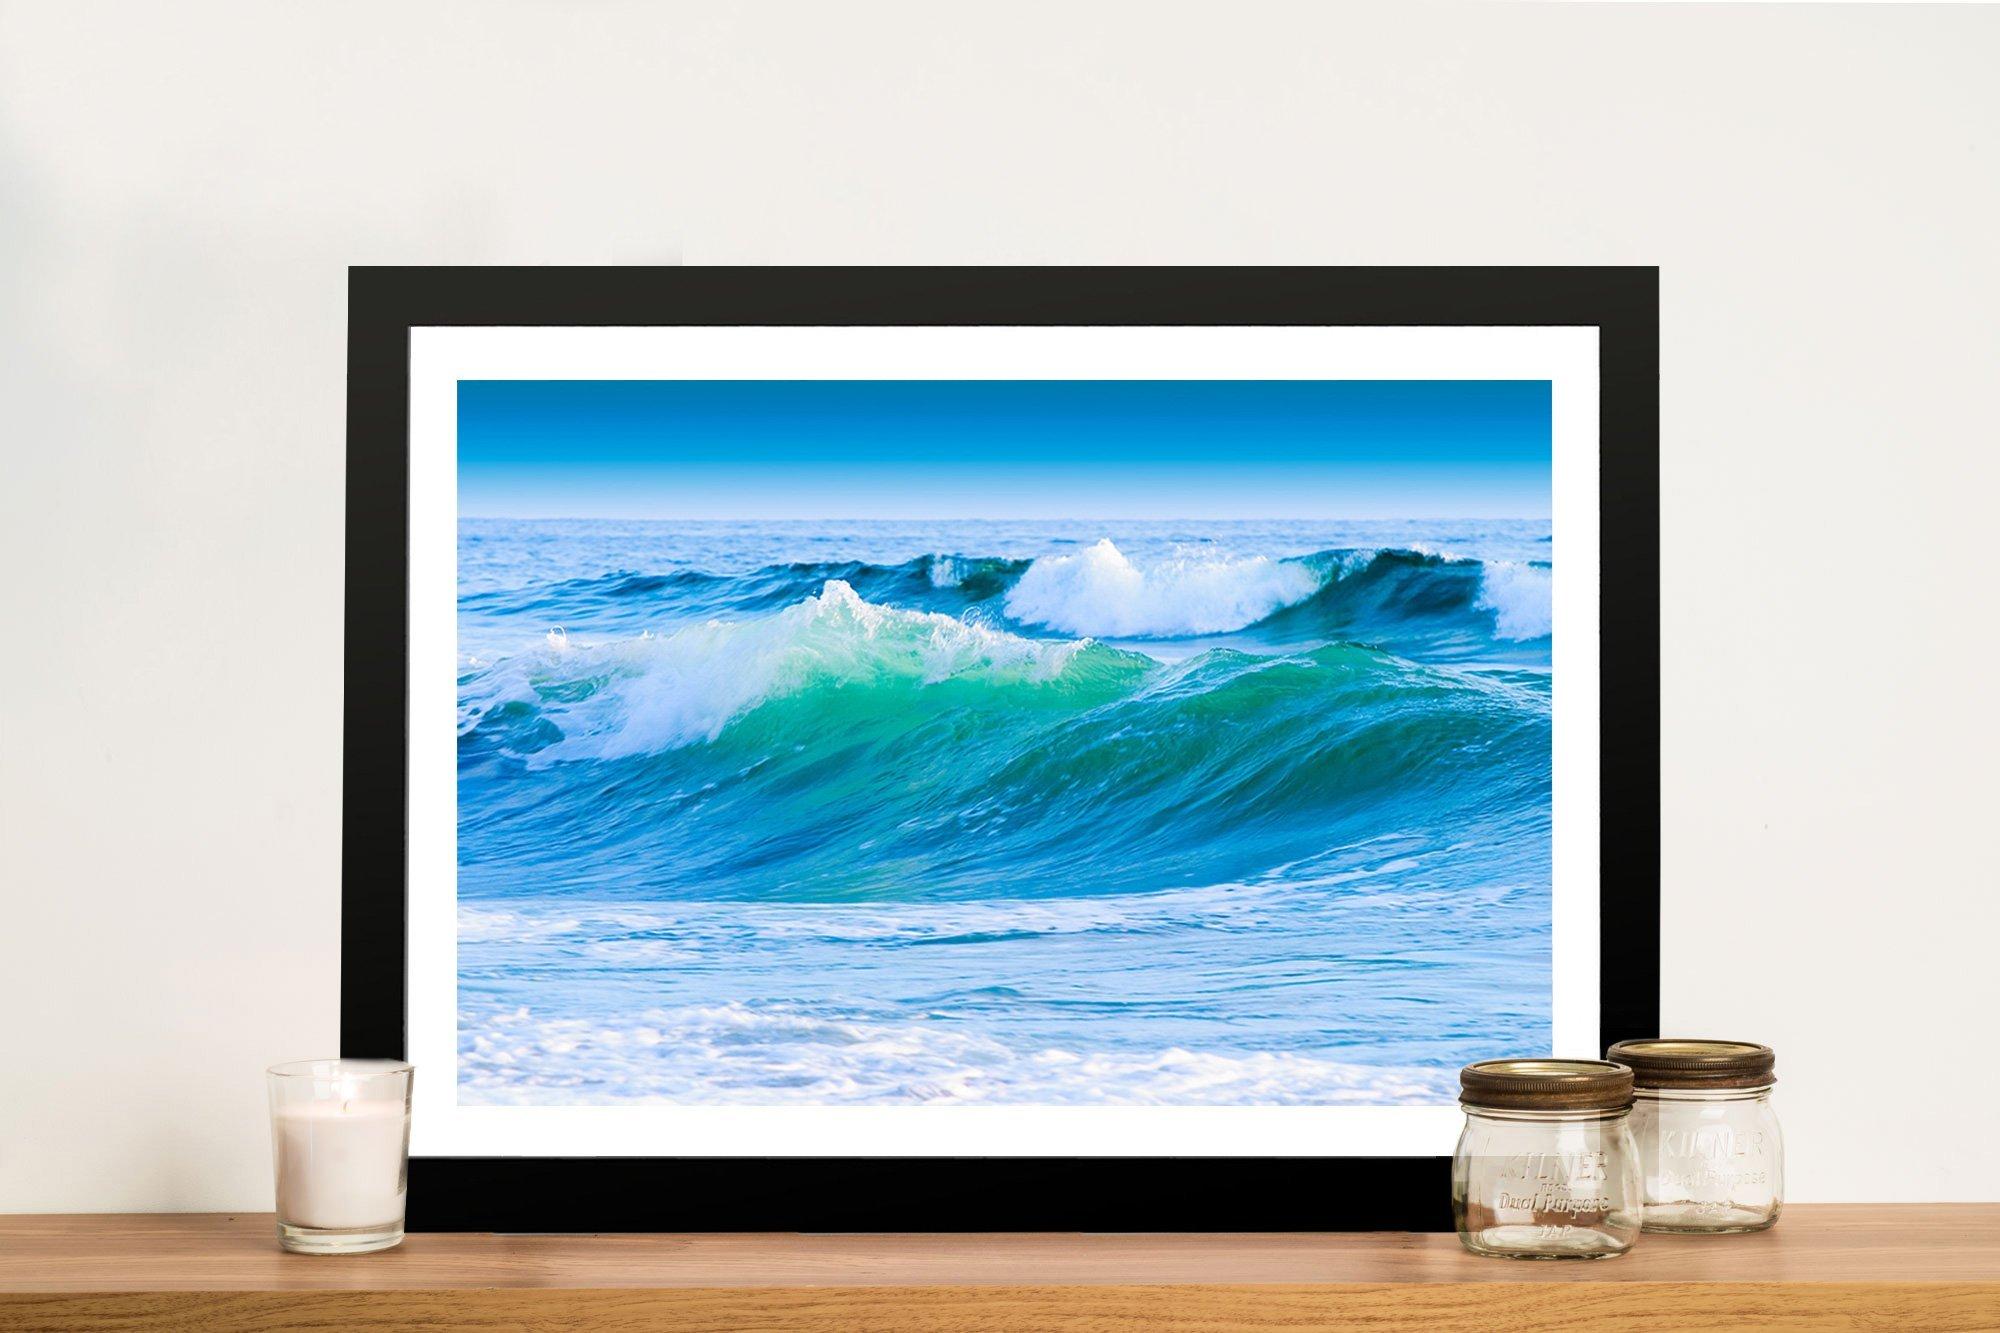 Azure Seas Framed Seascape on Canvas